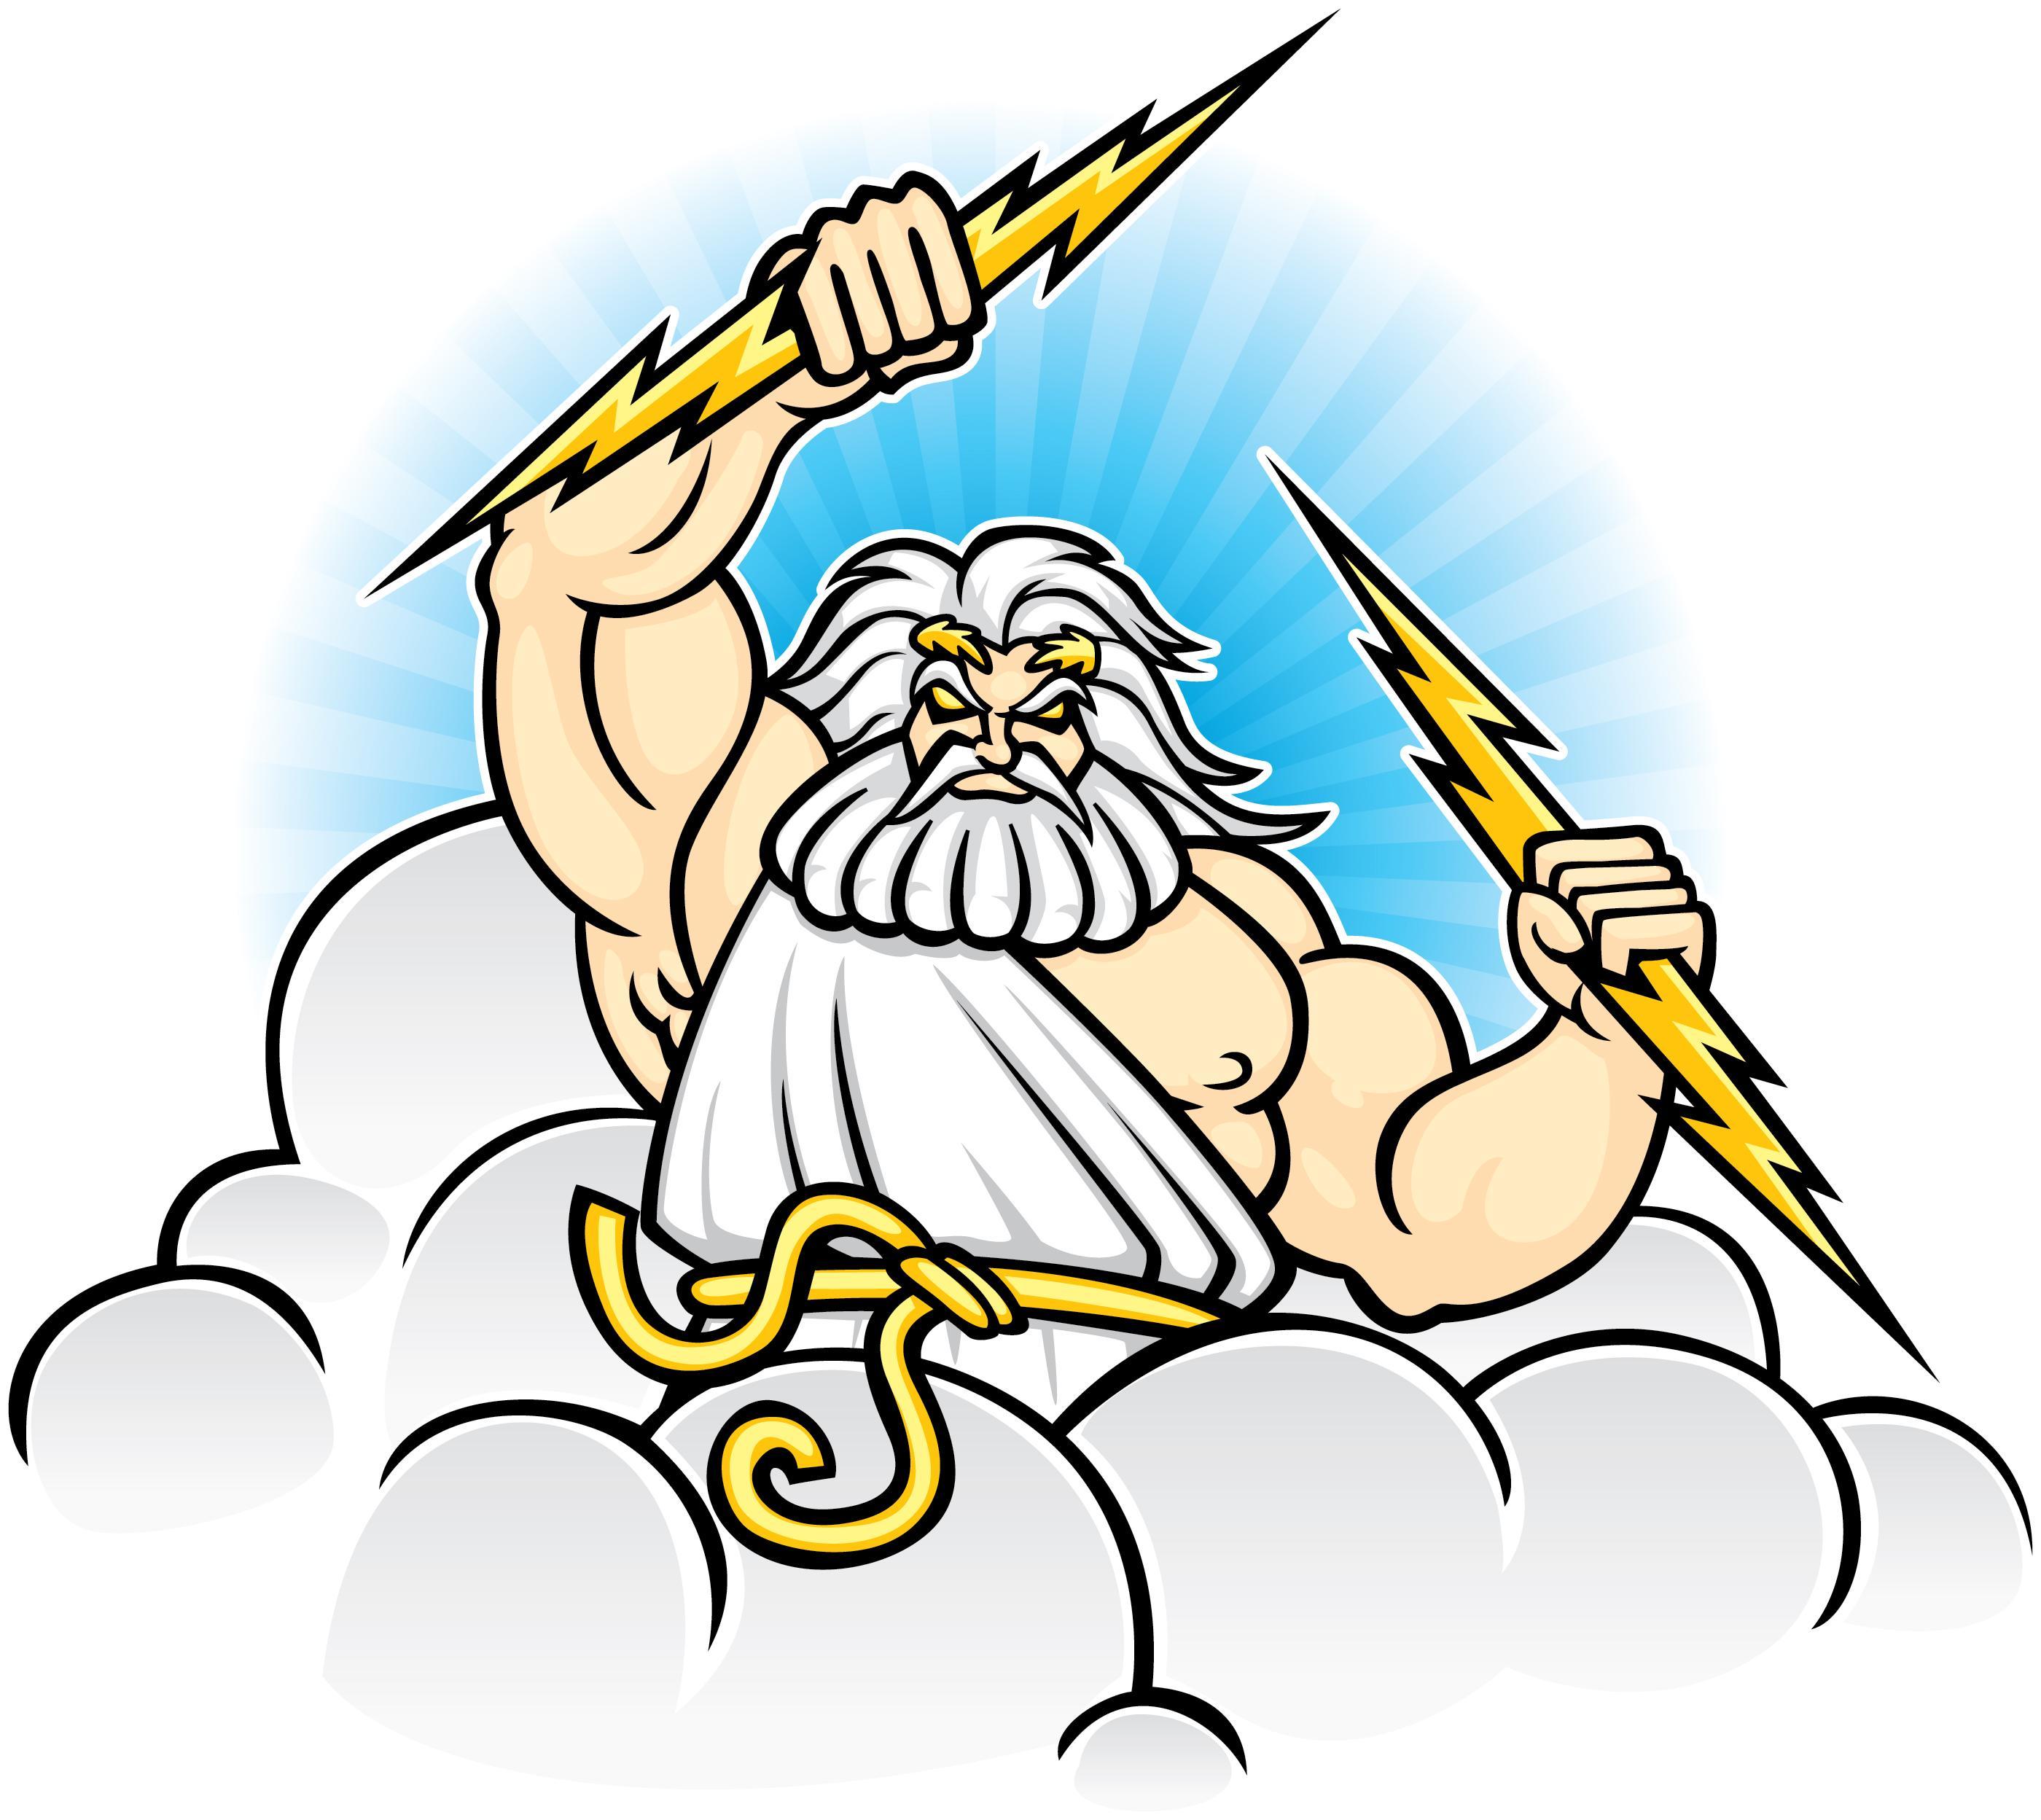 Zeus god clipart svg royalty free Zeus Clipart | Free download best Zeus Clipart on ClipArtMag.com svg royalty free